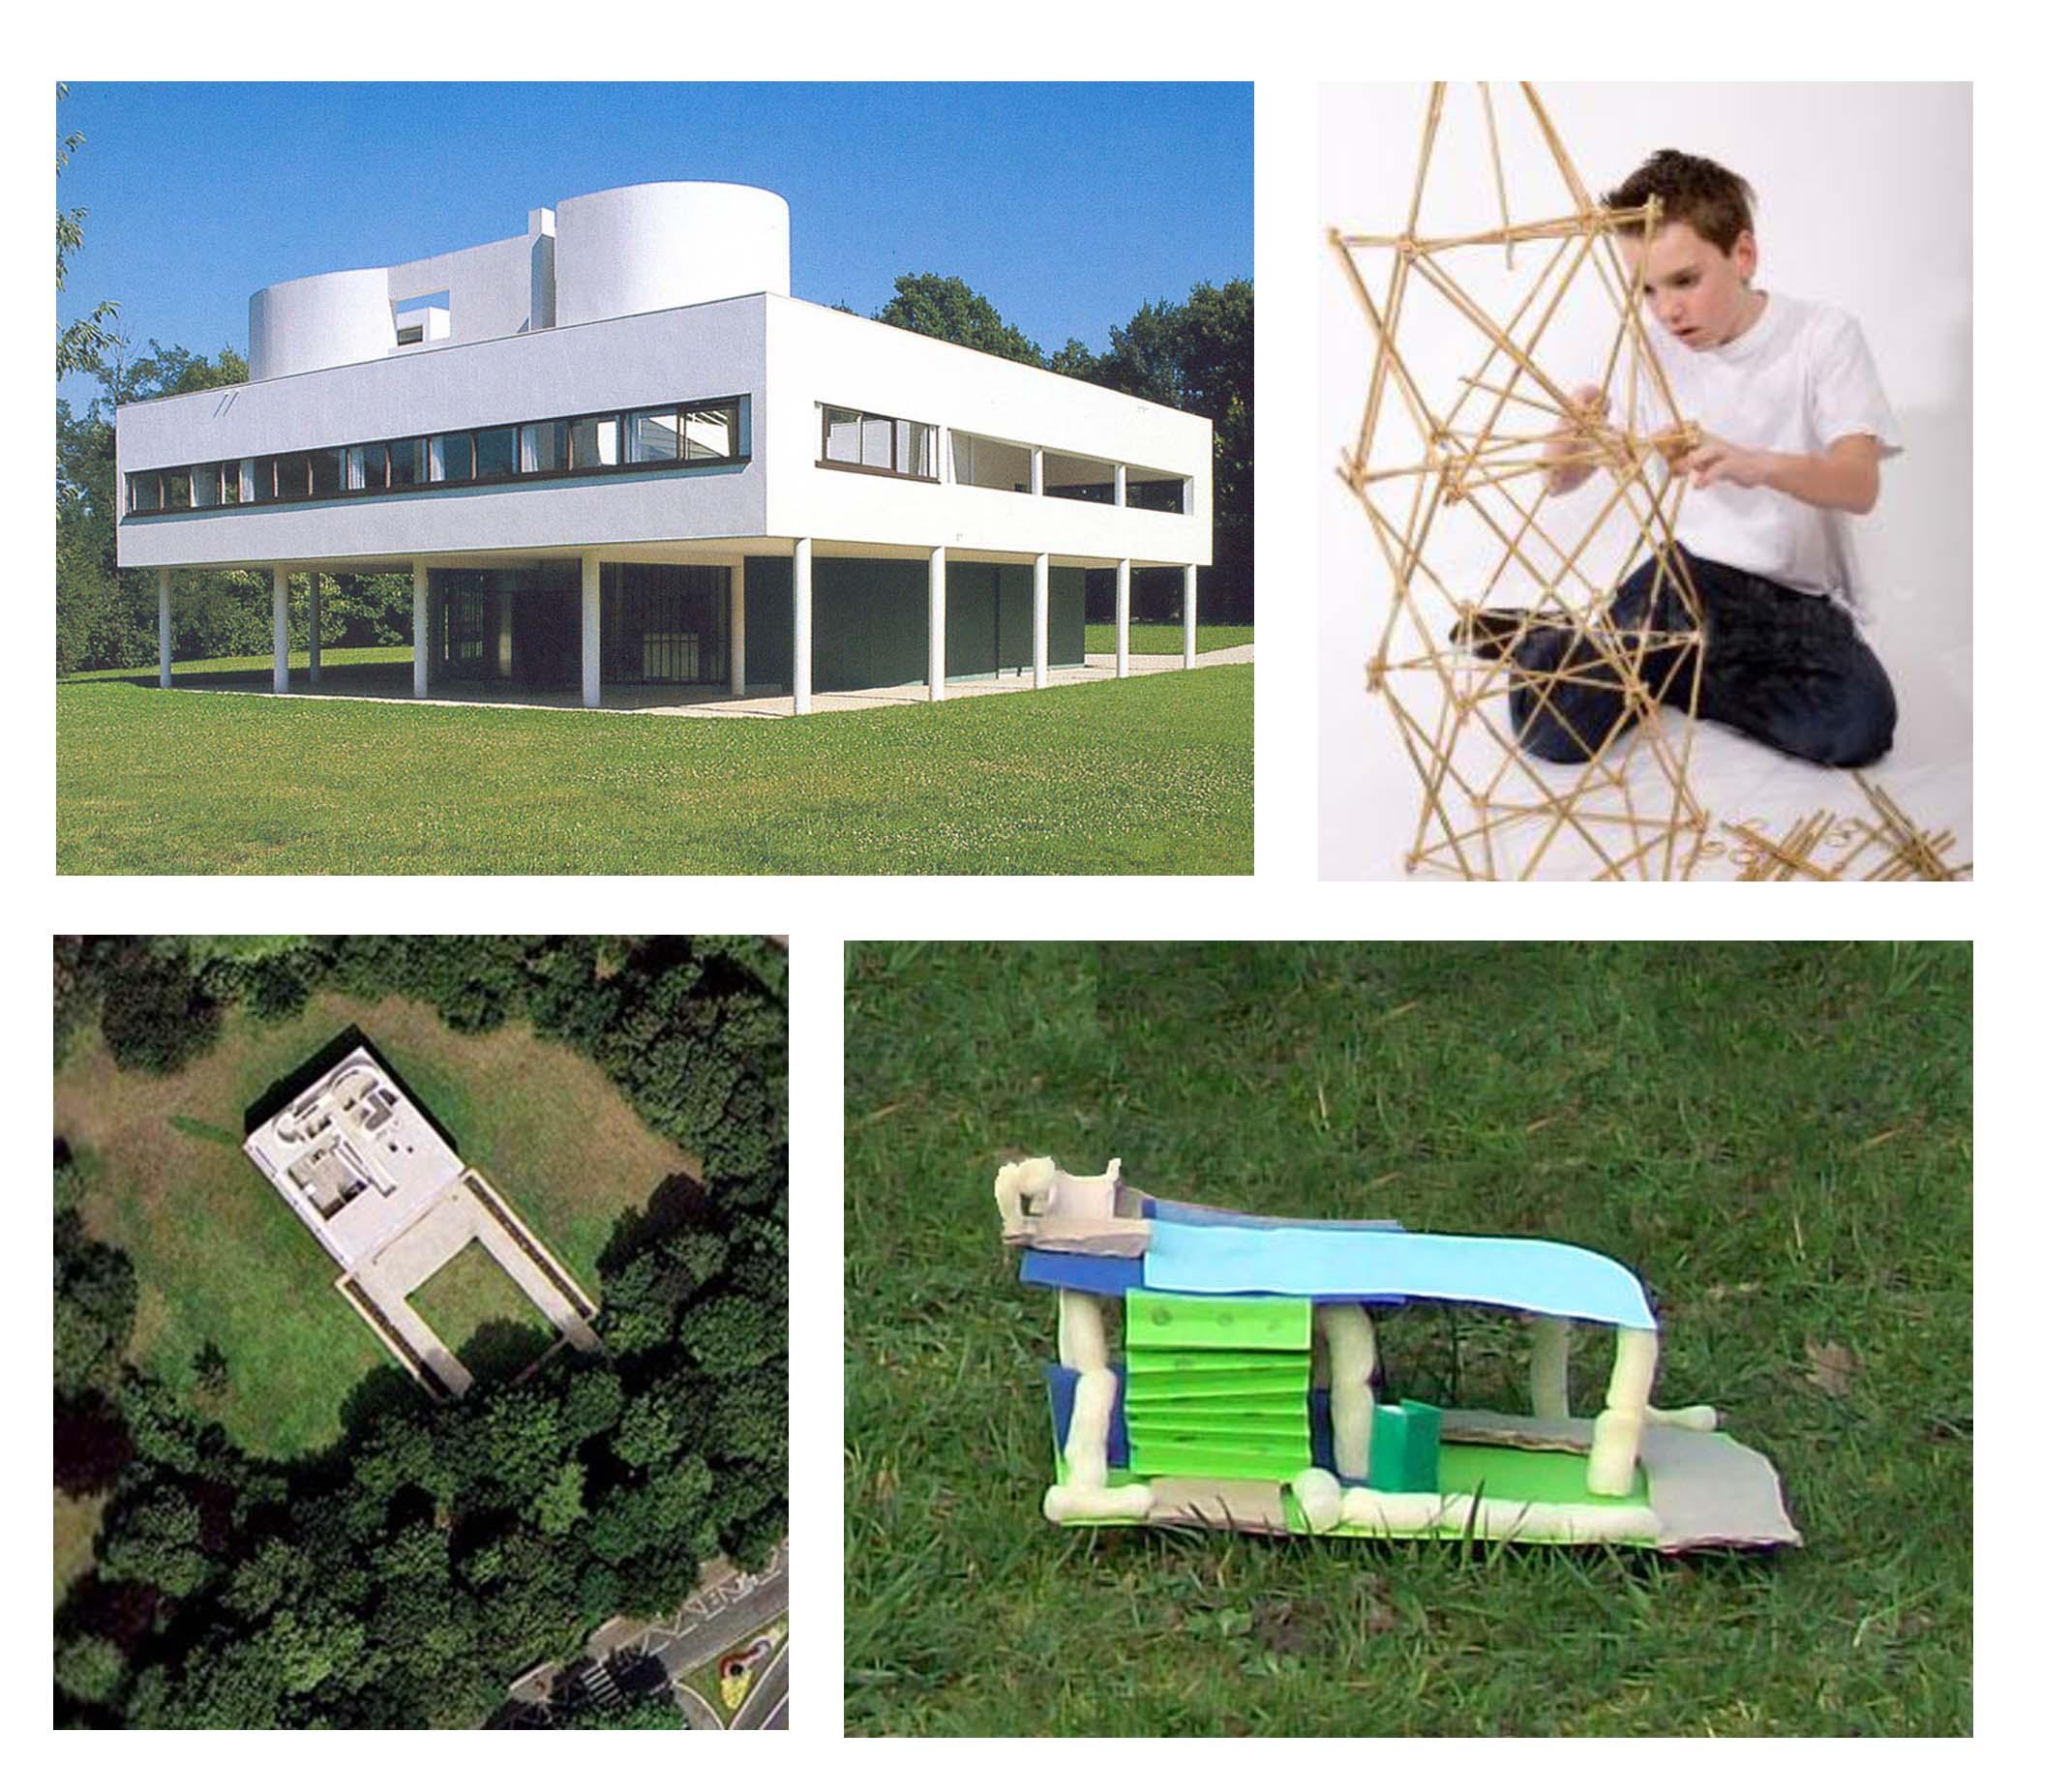 Connu La Villa Savoye Materiaux | Dudew.com VI67